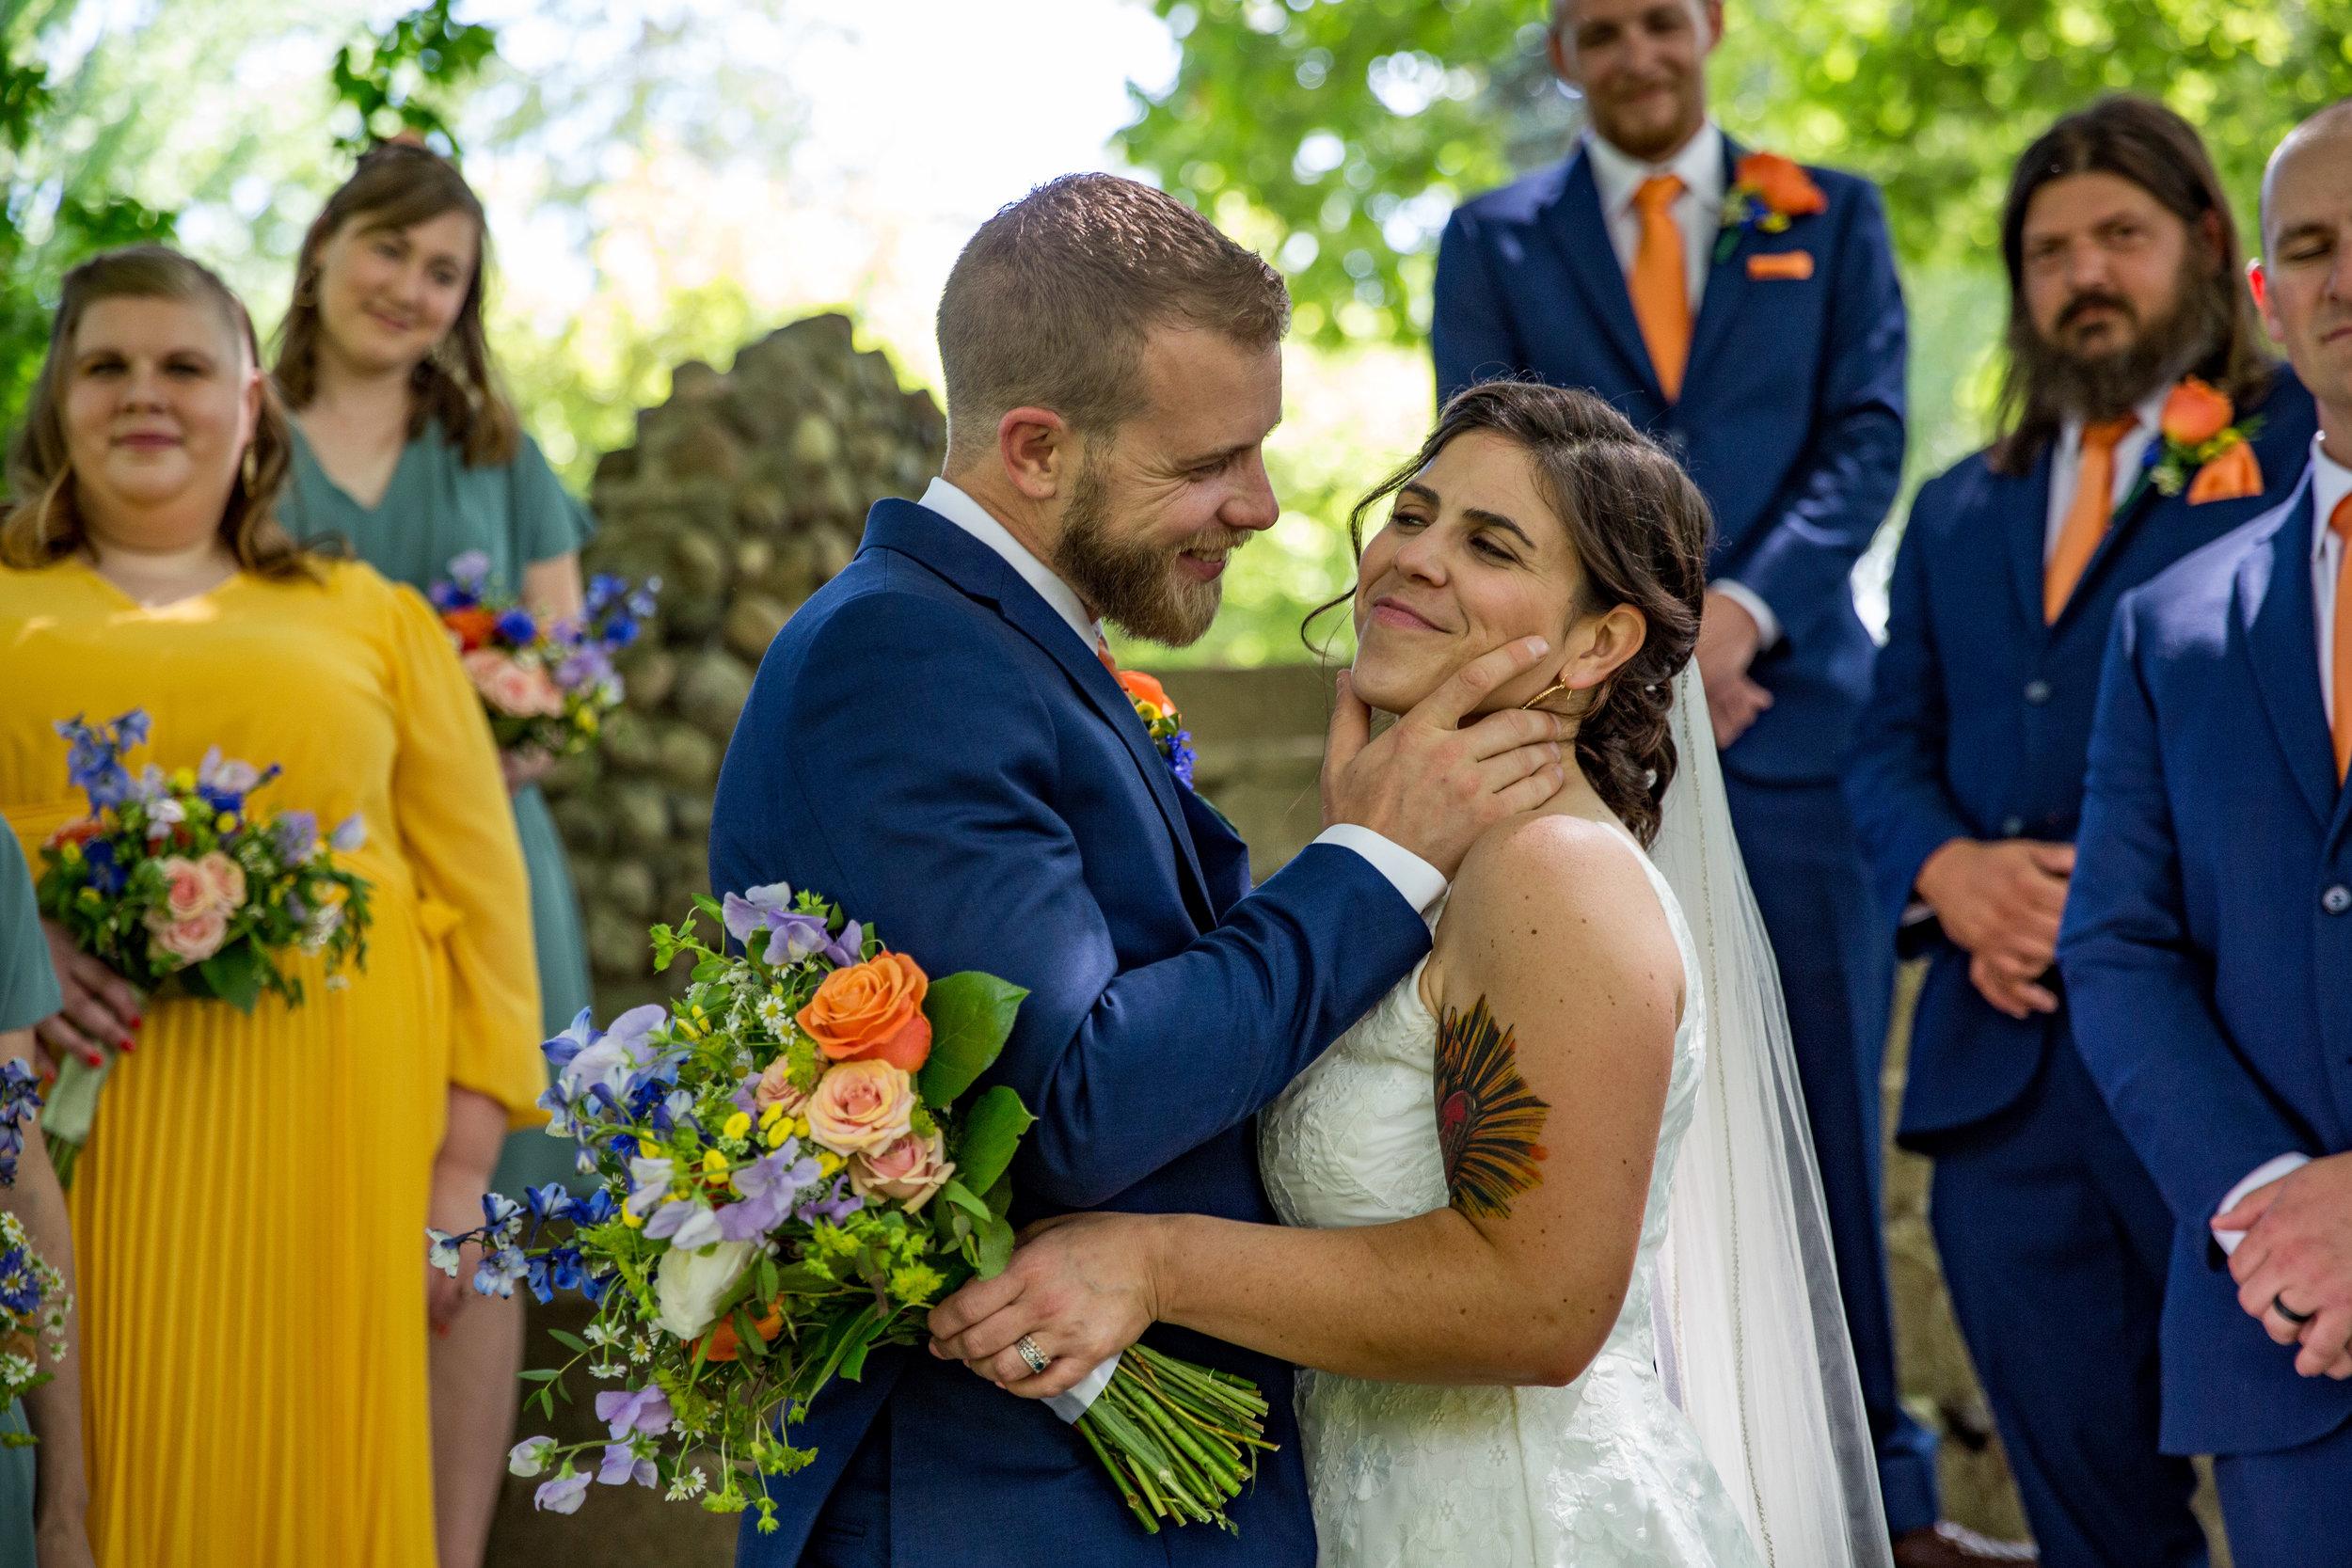 Natalie and Dallas Mooney Wedding 6-8-19_Tania Watt Photography-307.jpg